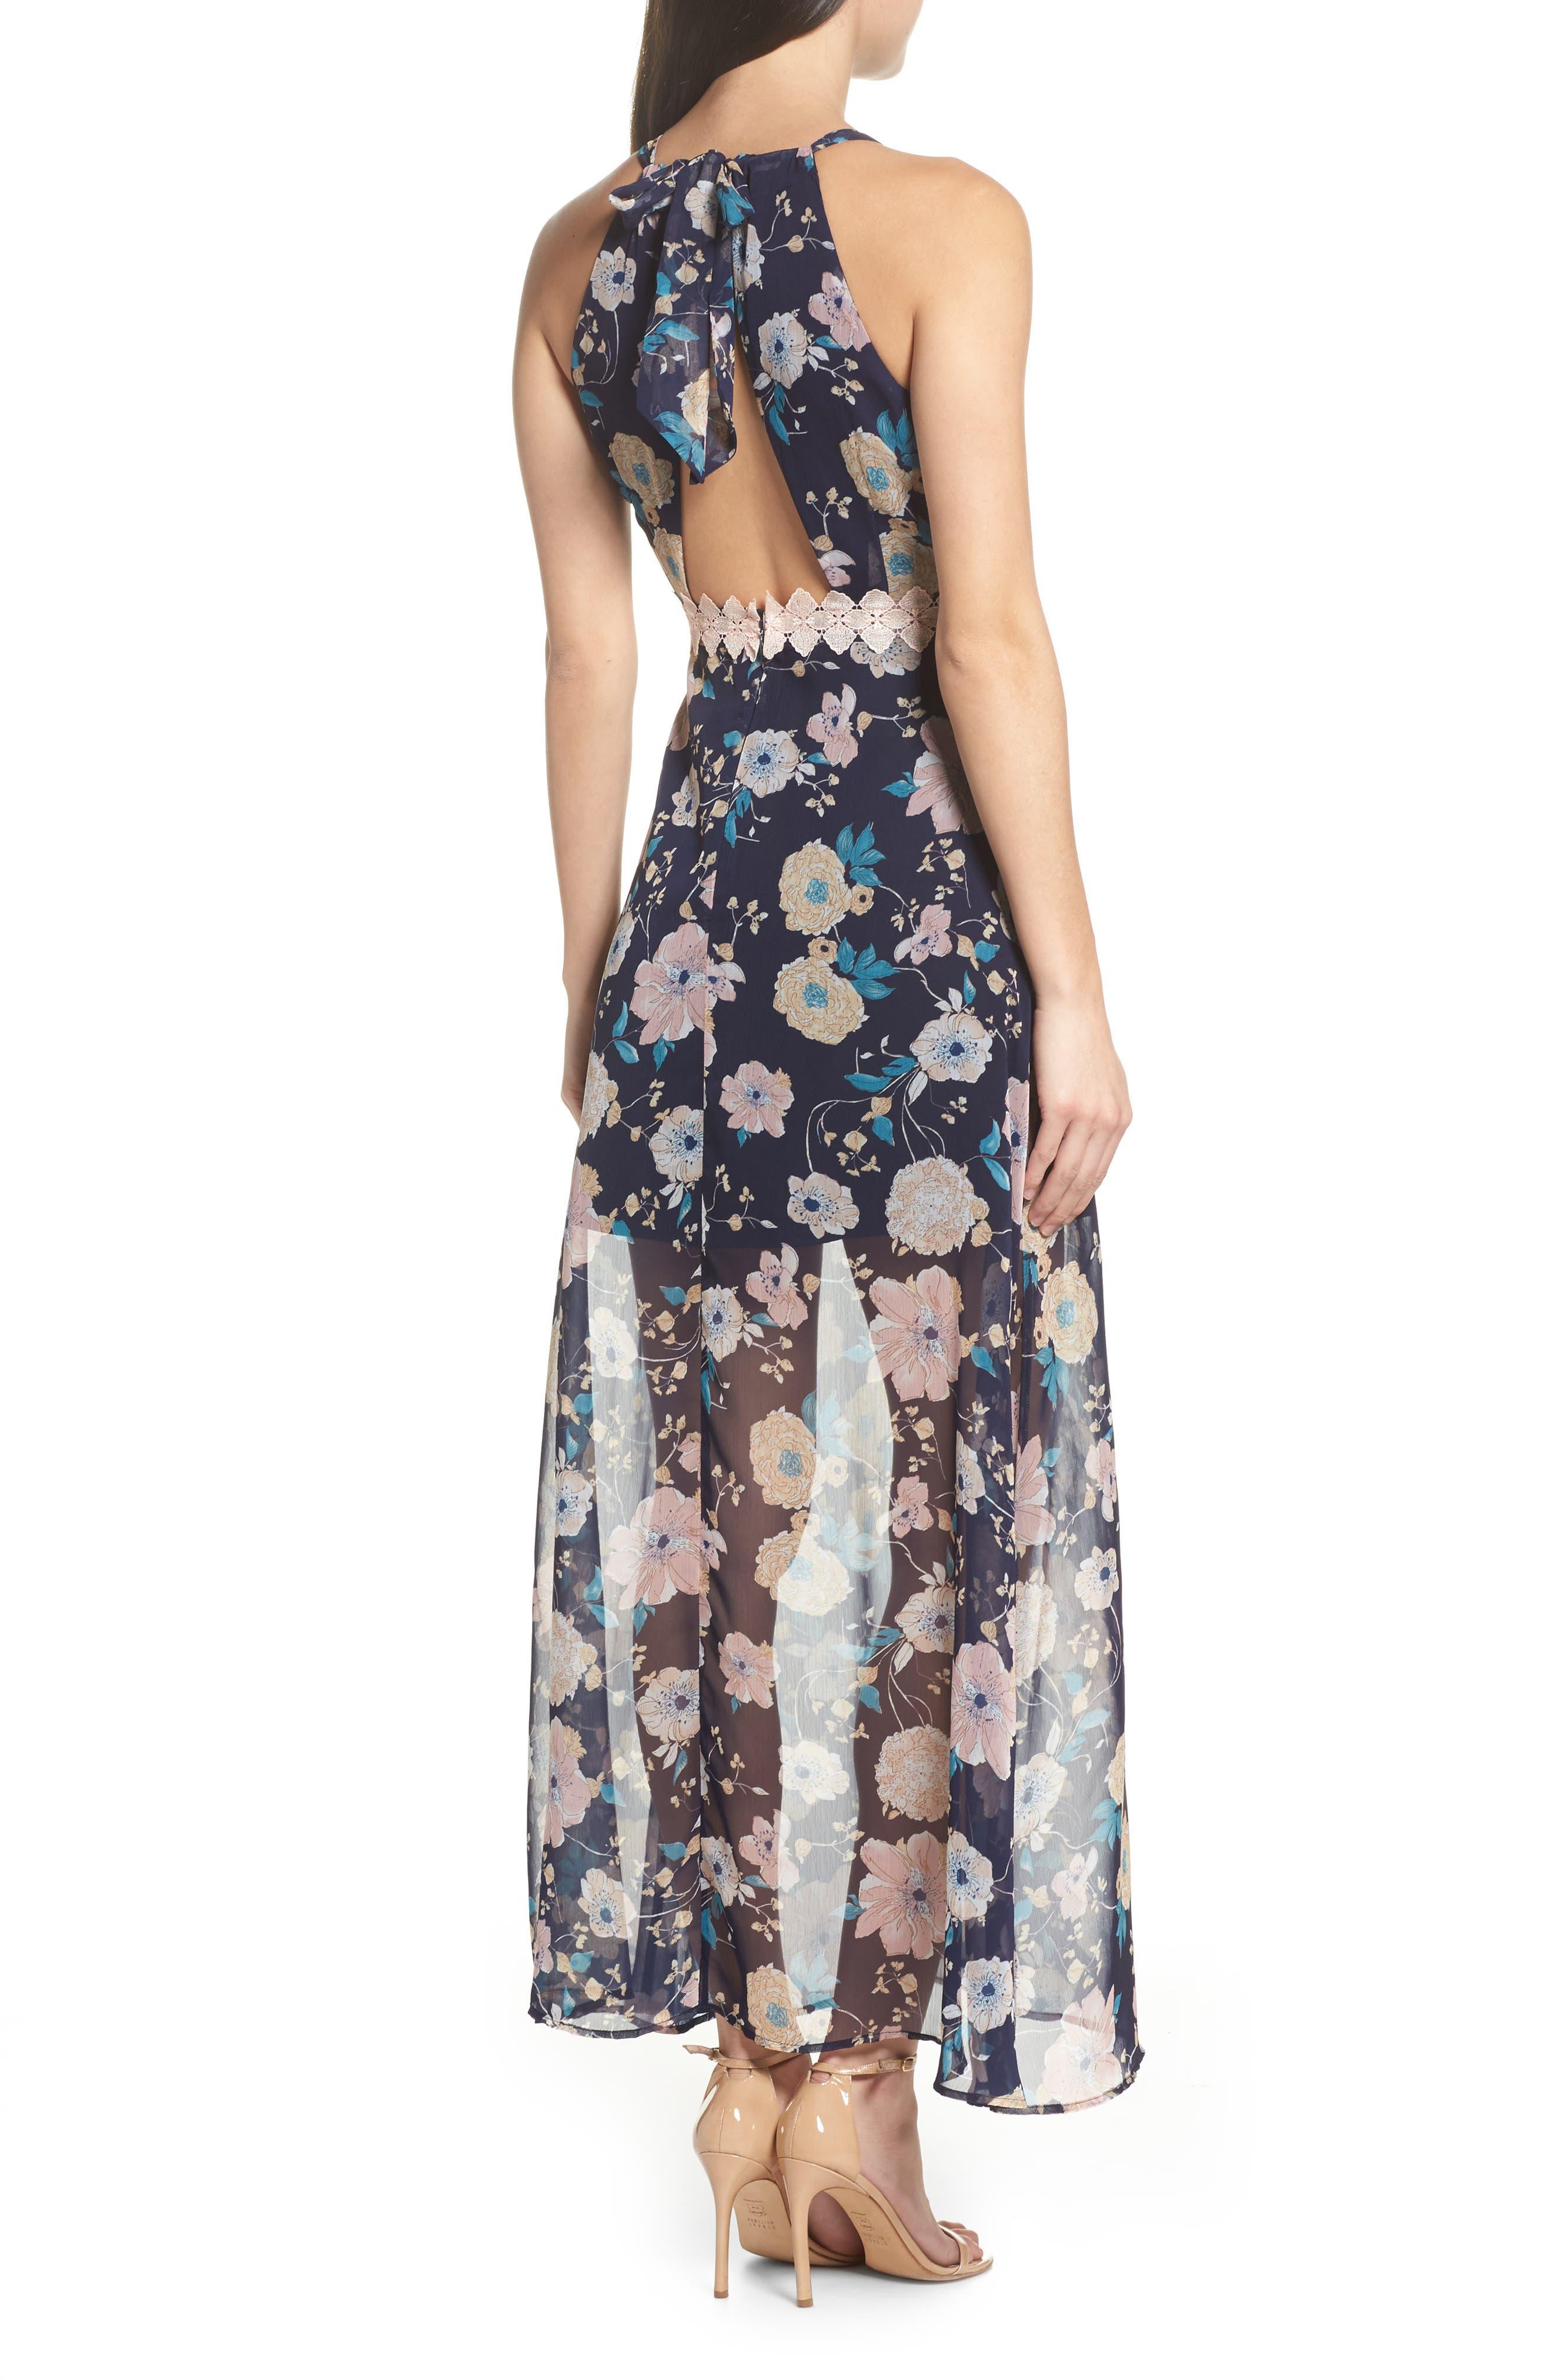 Brylee Floral Print Maxi Dress,                             Alternate thumbnail 2, color,                             400